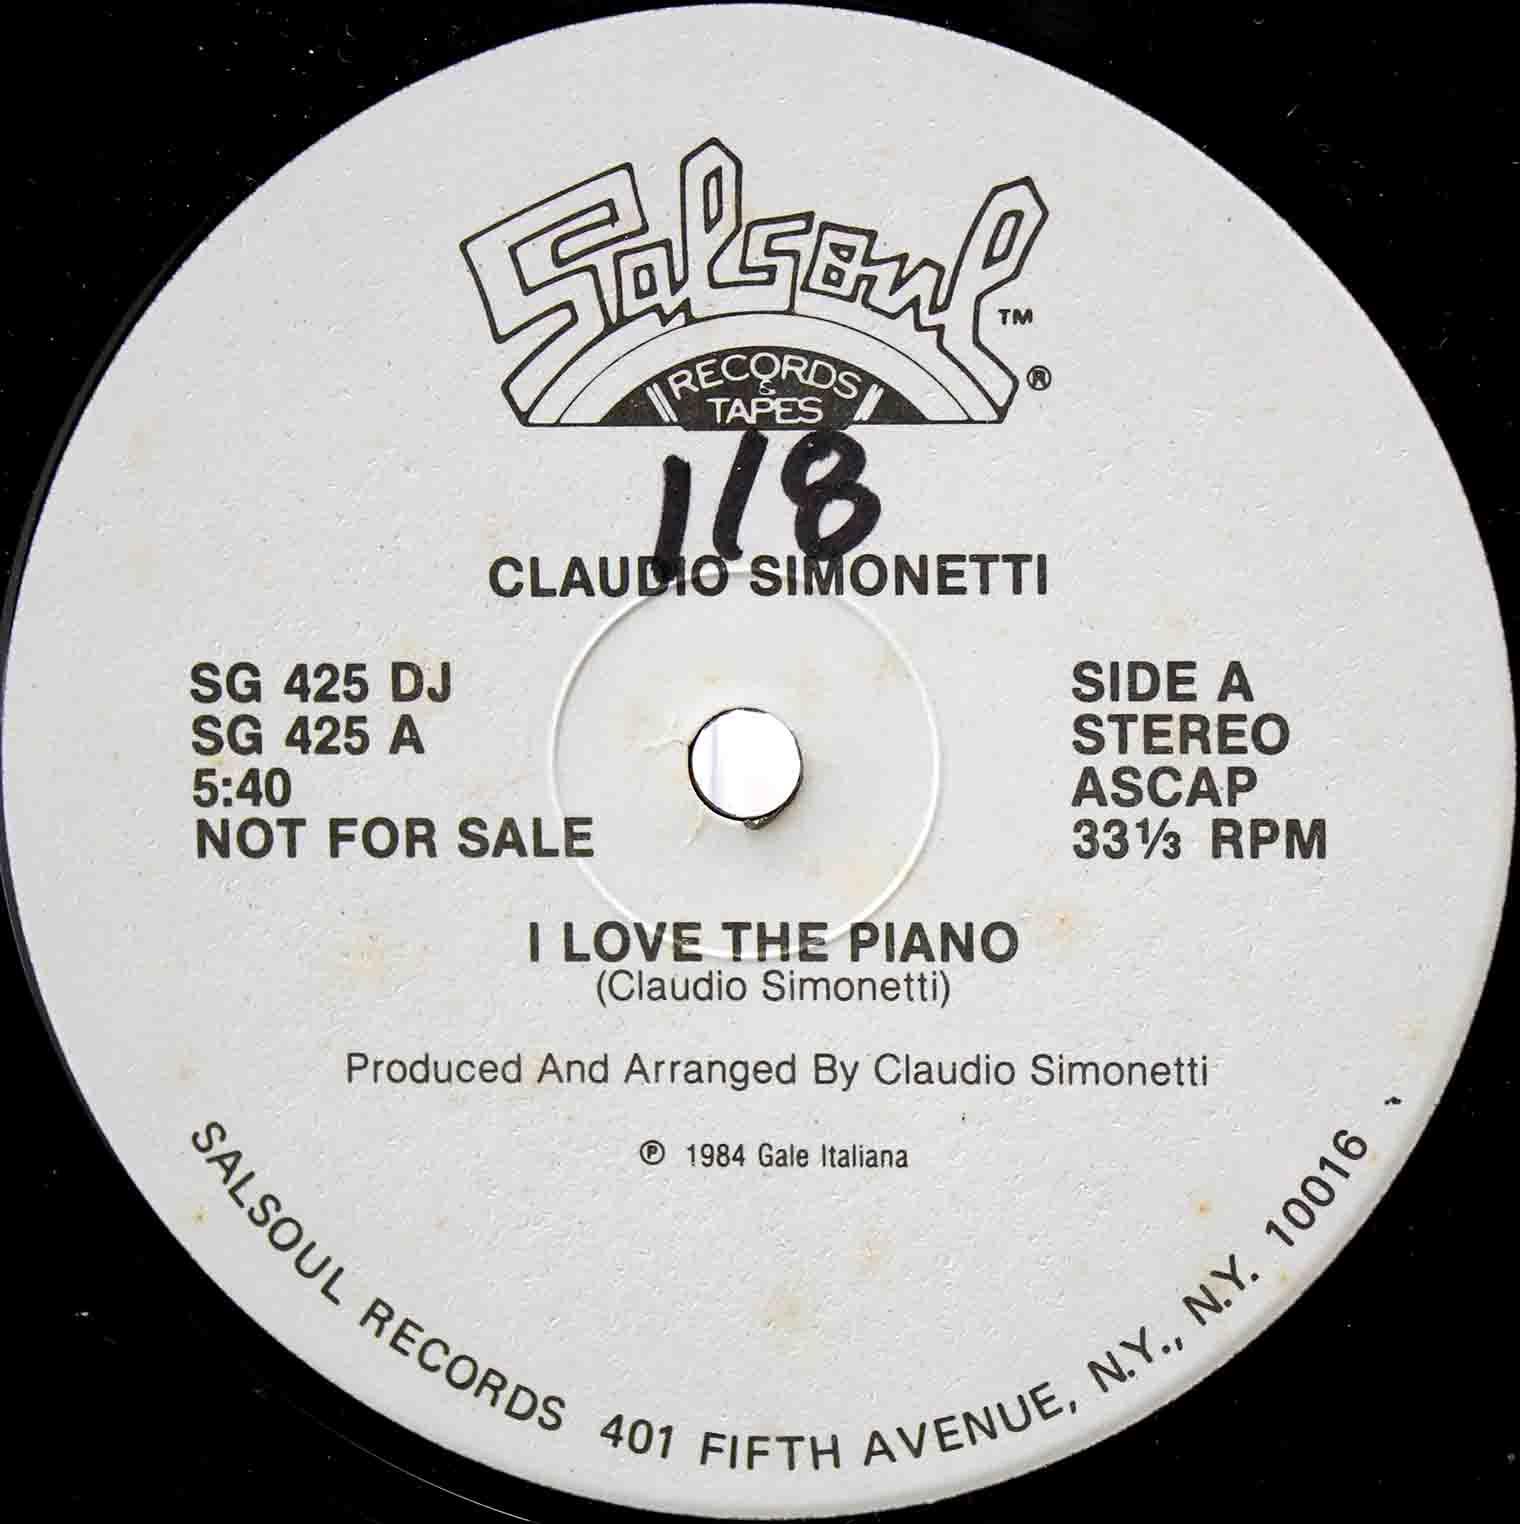 Claudio Simonetti – I Love The Piano US 03